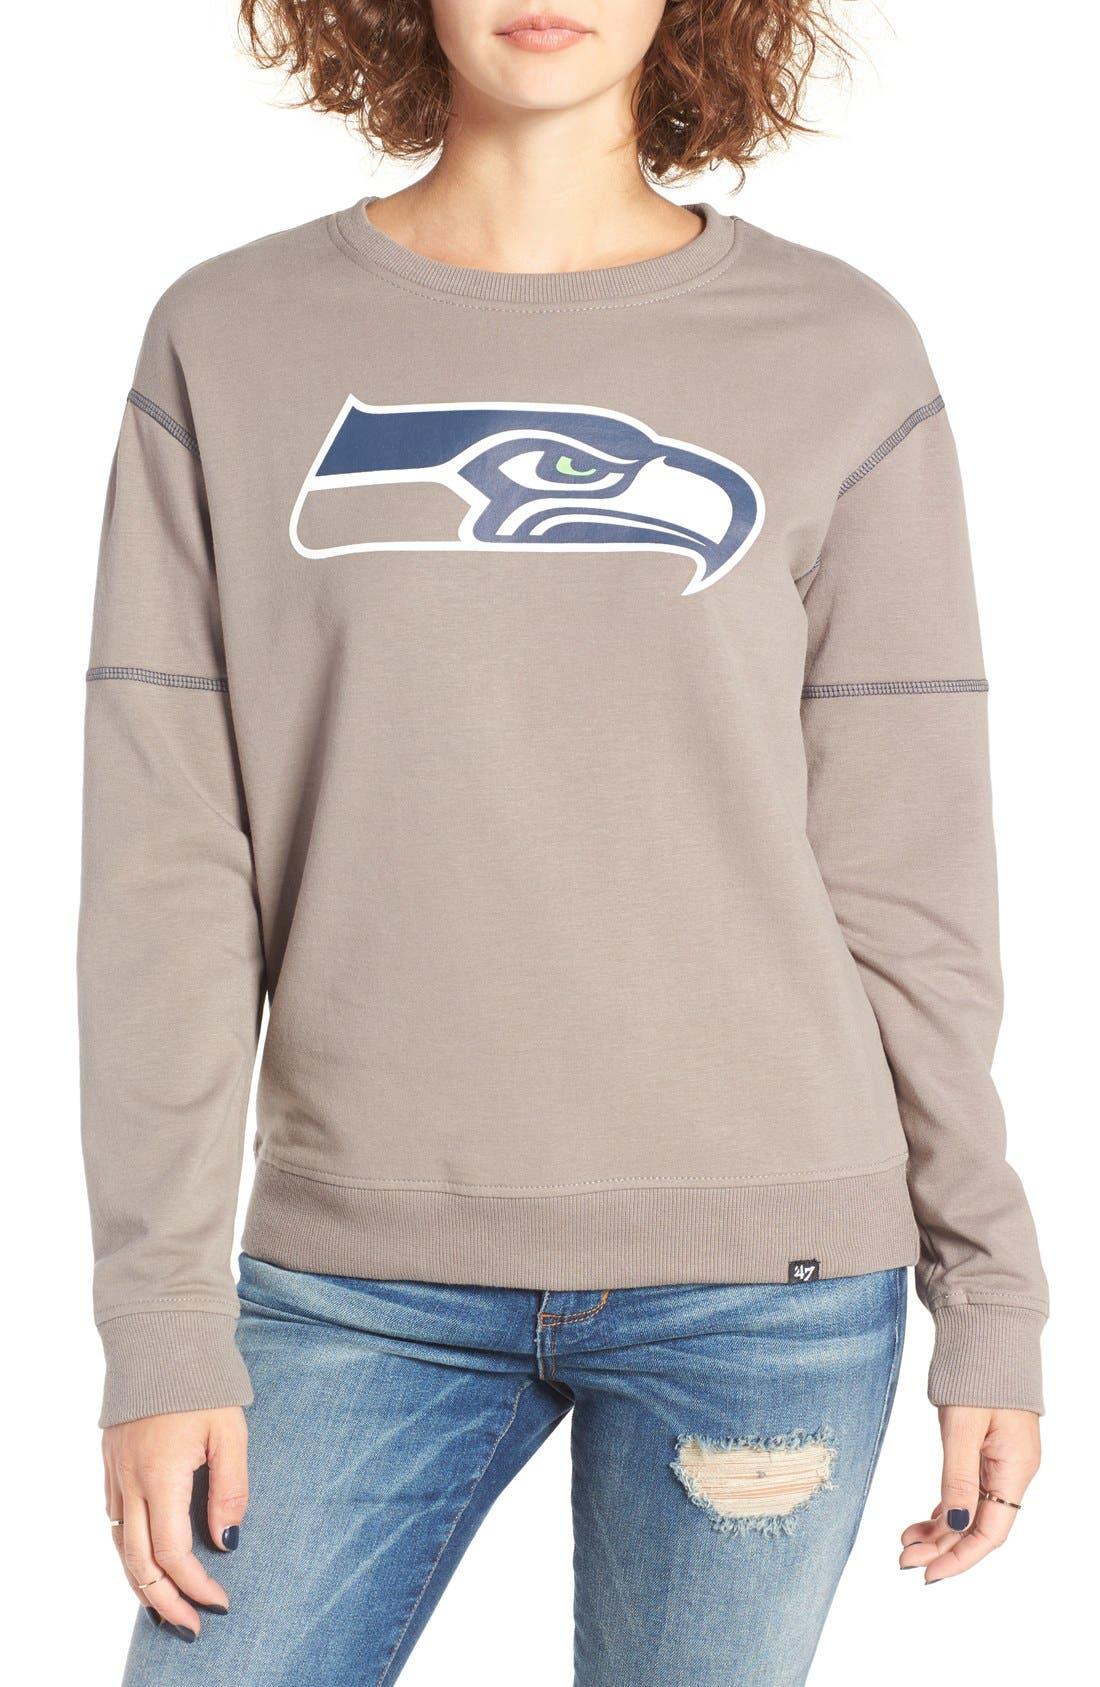 Main Image - '47 'Seattle Seahawks' Graphic Sweatshirt